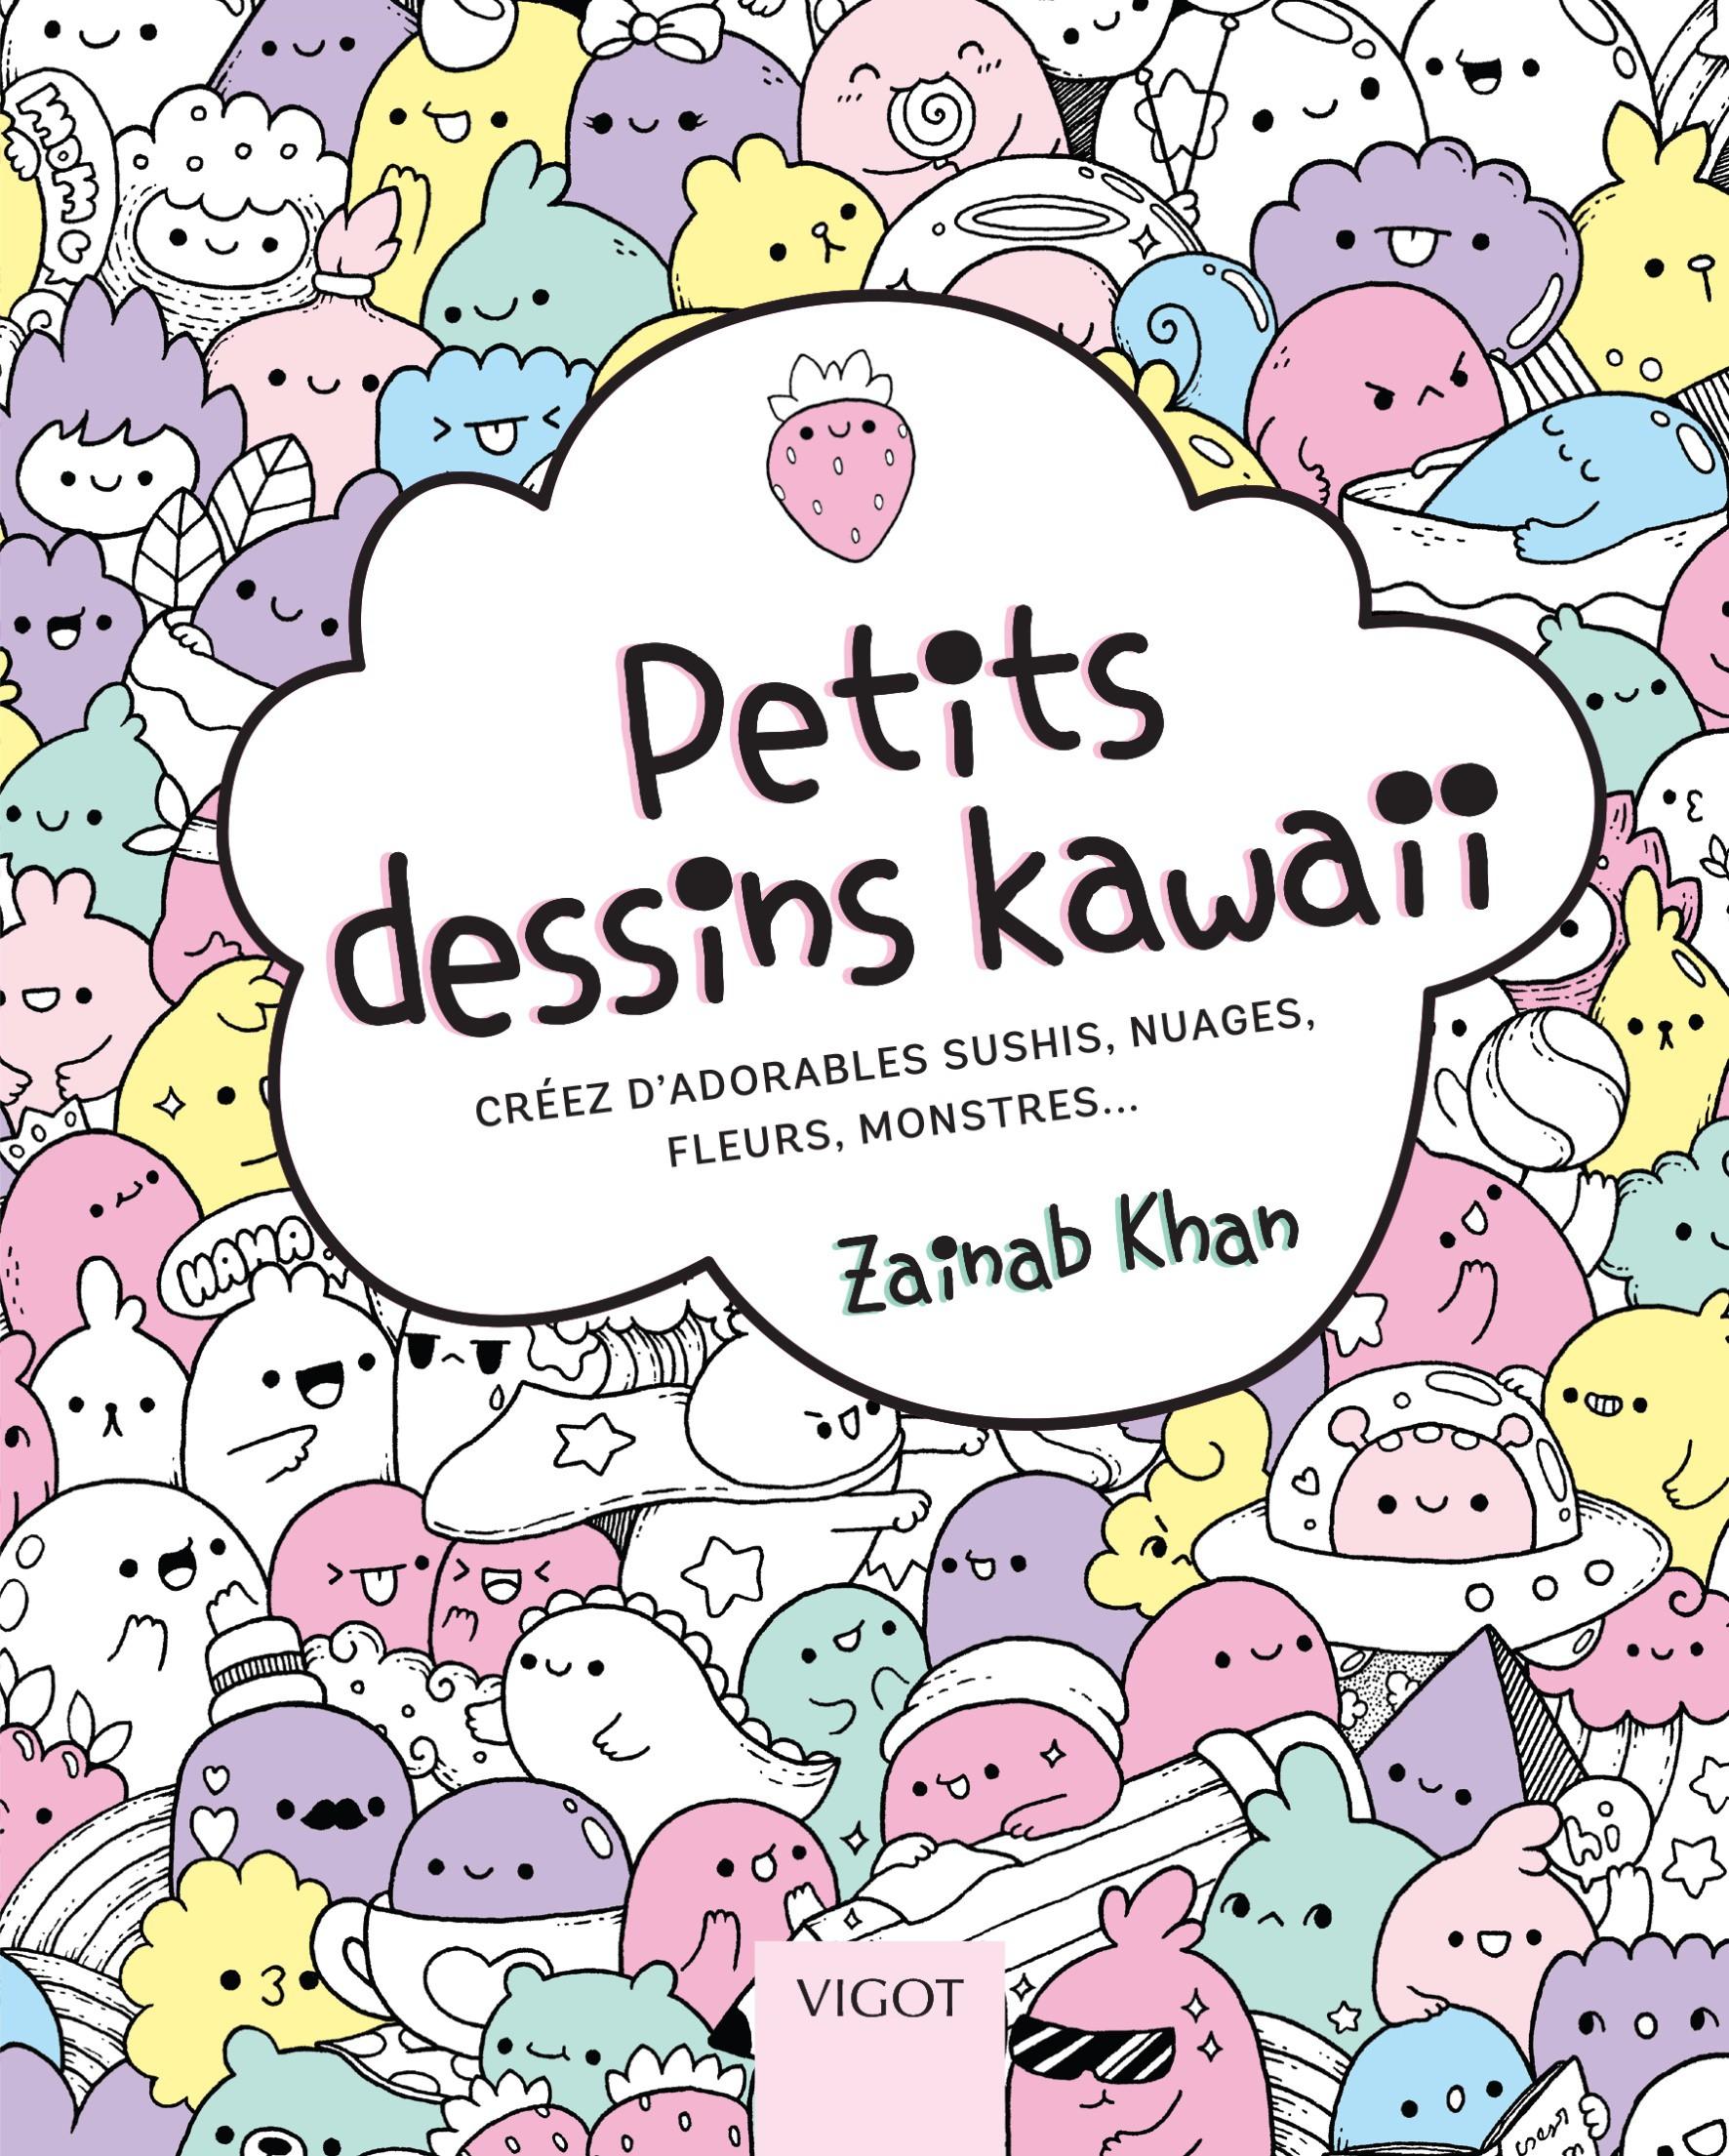 dessin kawaii - Les dessins et coloriage